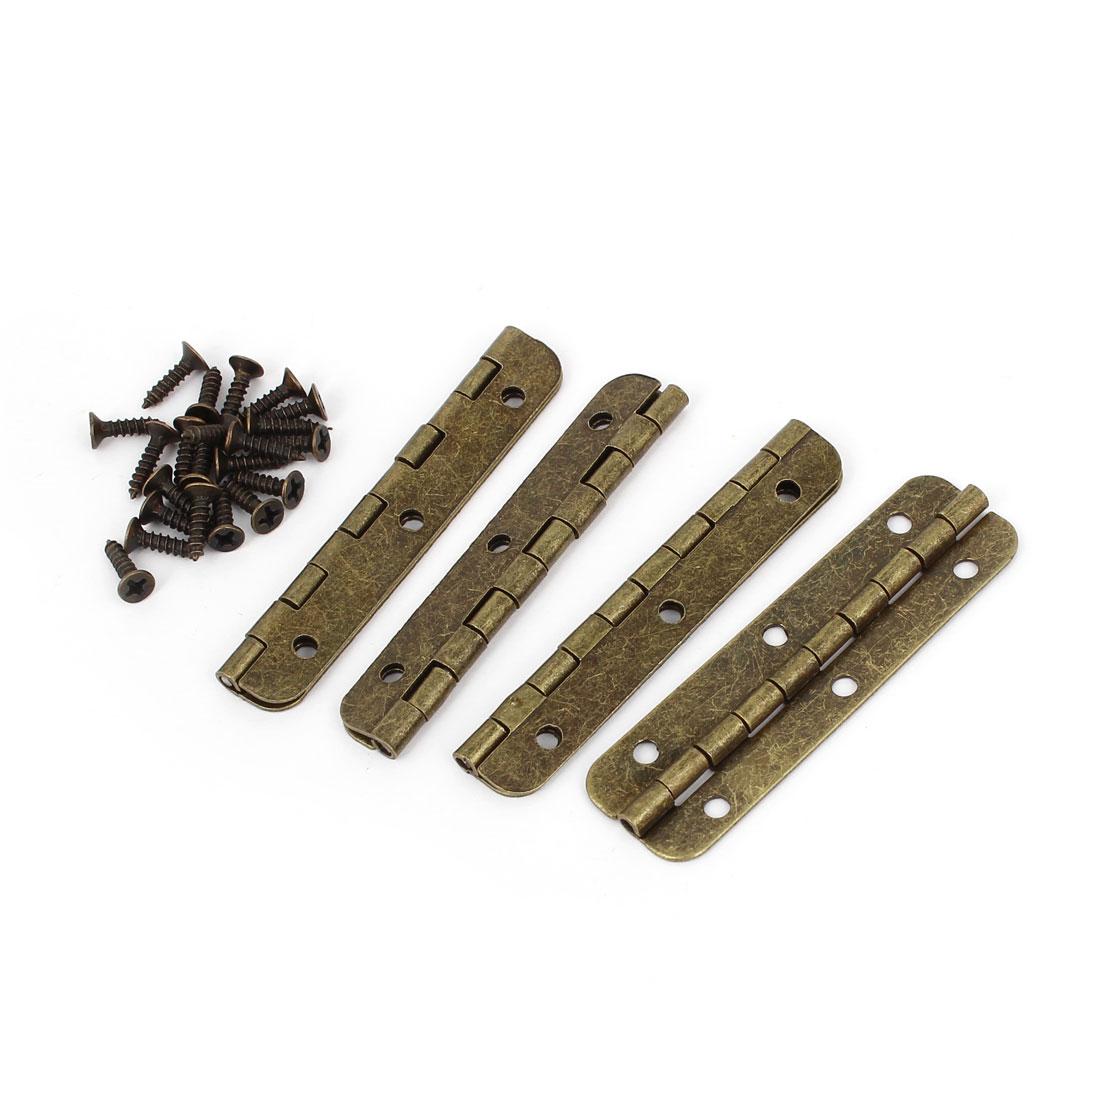 4 Pcs/lot Bronze Tone Rotatable Drawer Dresser Door Butt Hinges 5cm Long(China (Mainland))